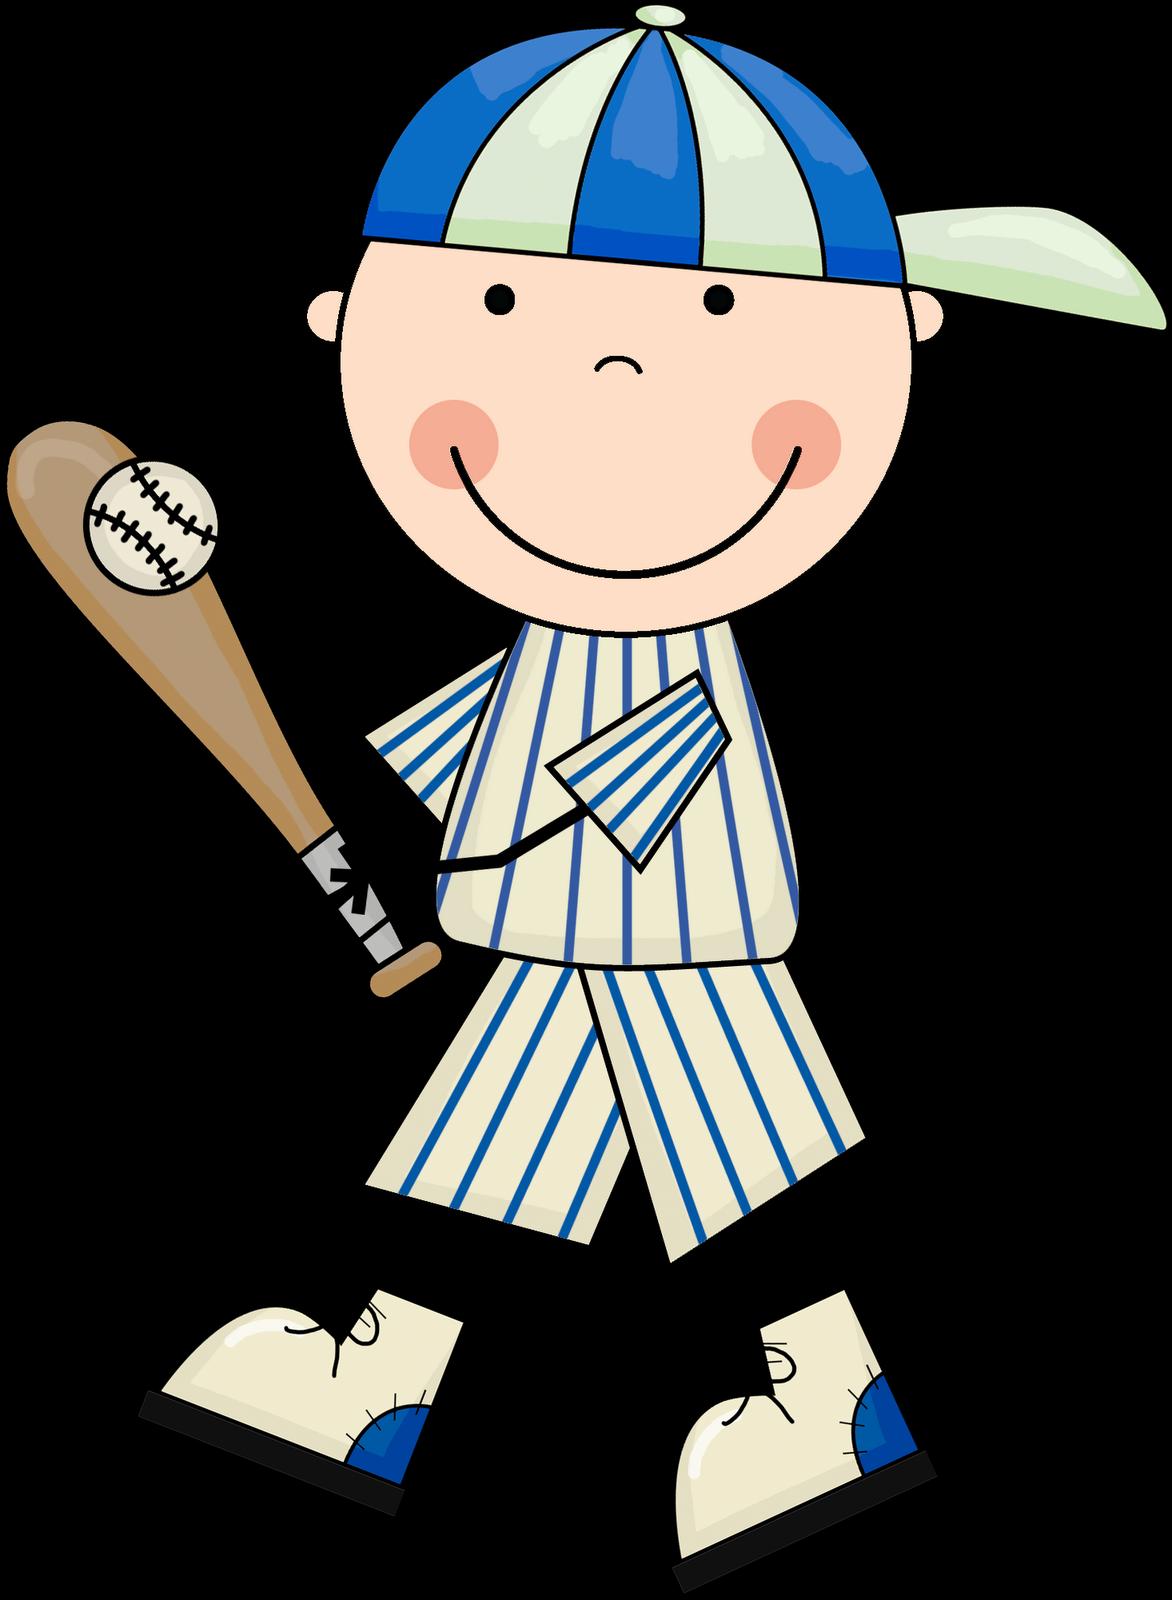 banner royalty free Clipart kid. Boys baseball clip art.